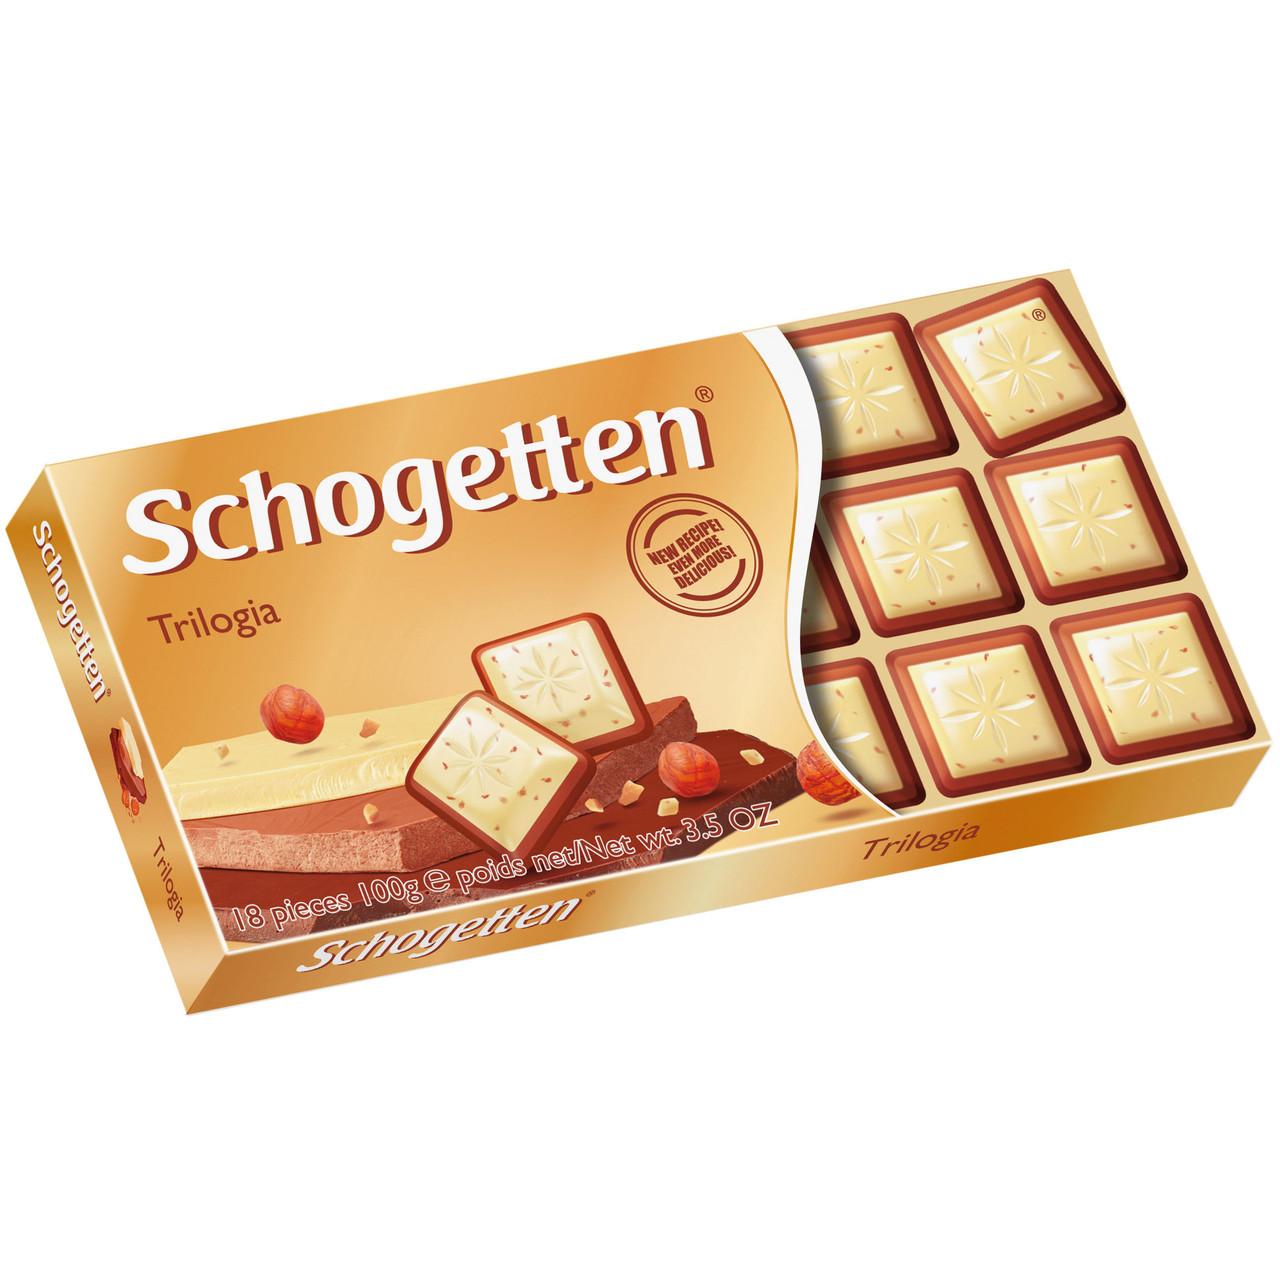 Шоколад Schogetten Trilogia 100 гр.